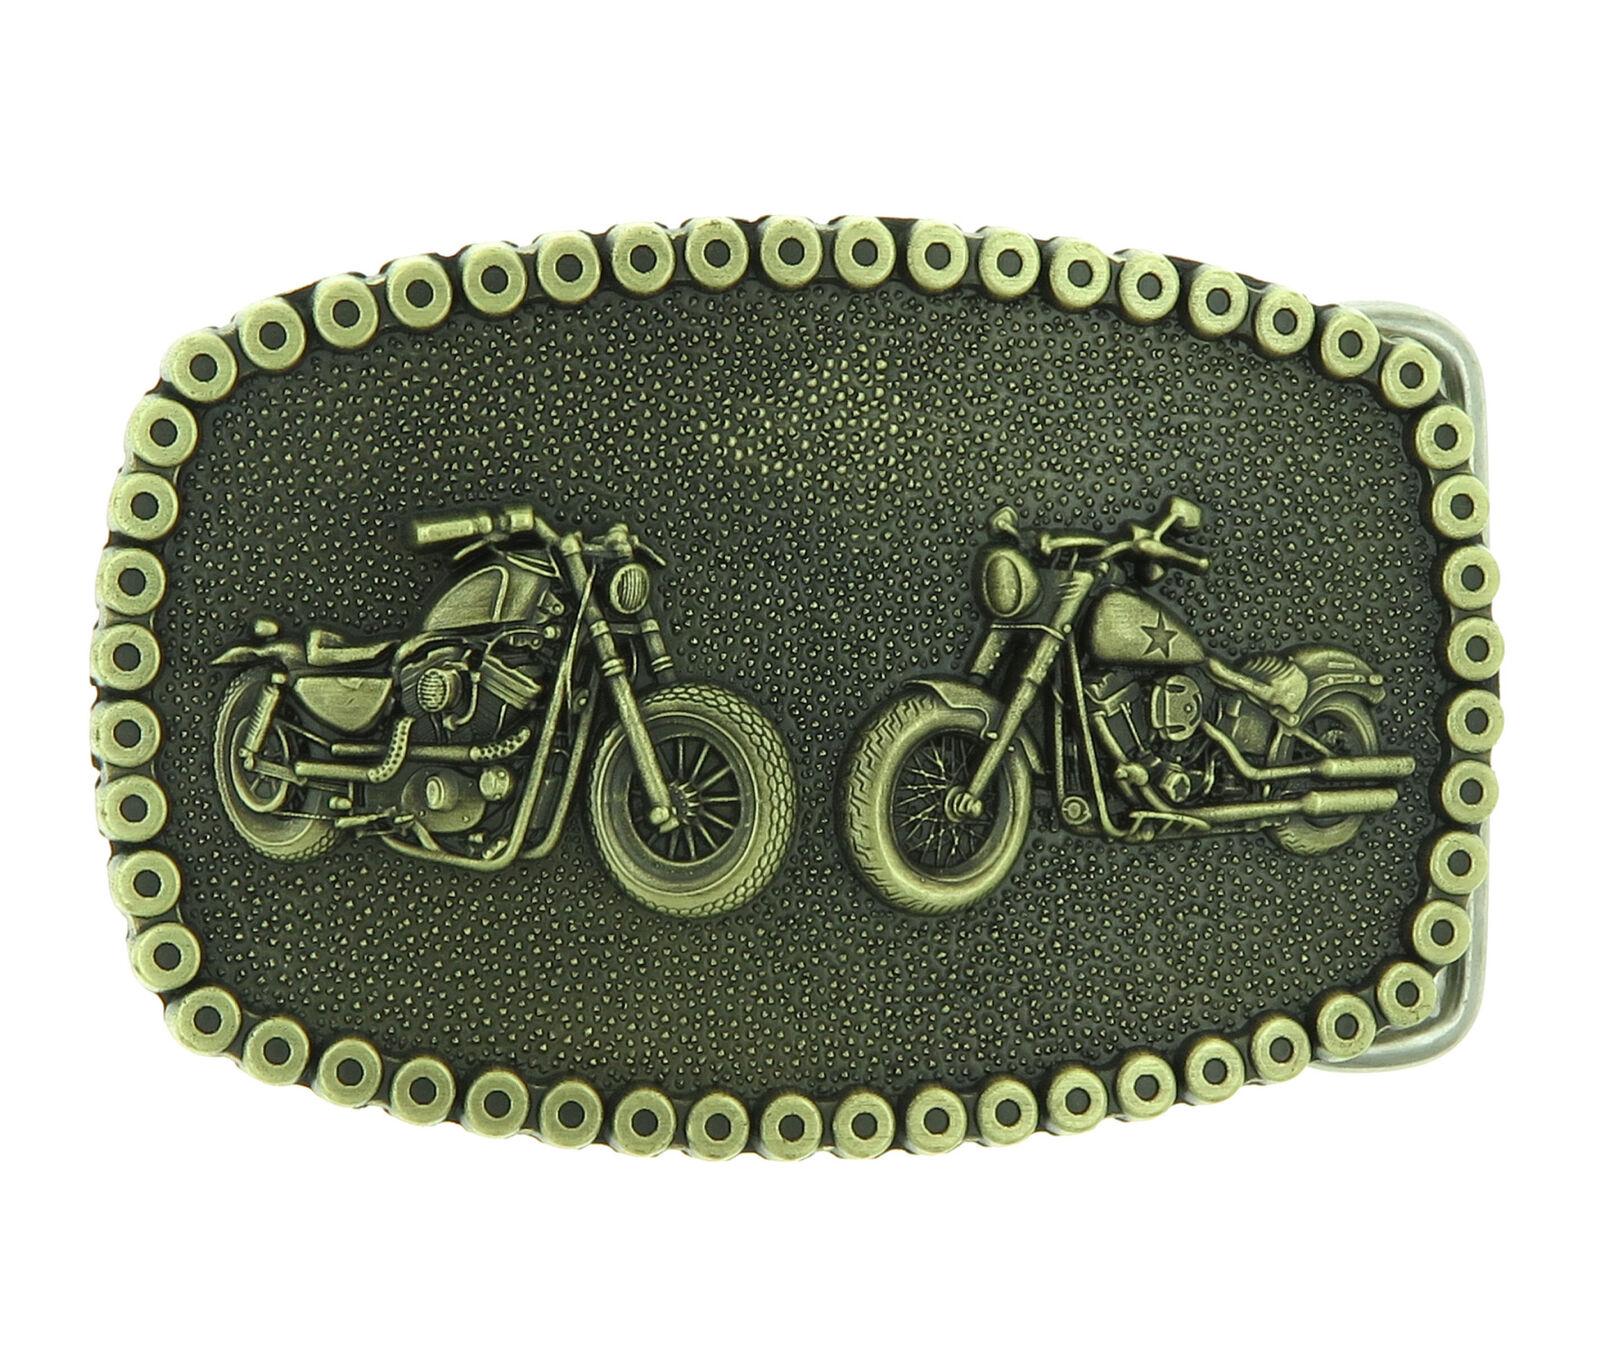 Motorcycle Chain Bikes Biker Bronze Plated Belt Buckle